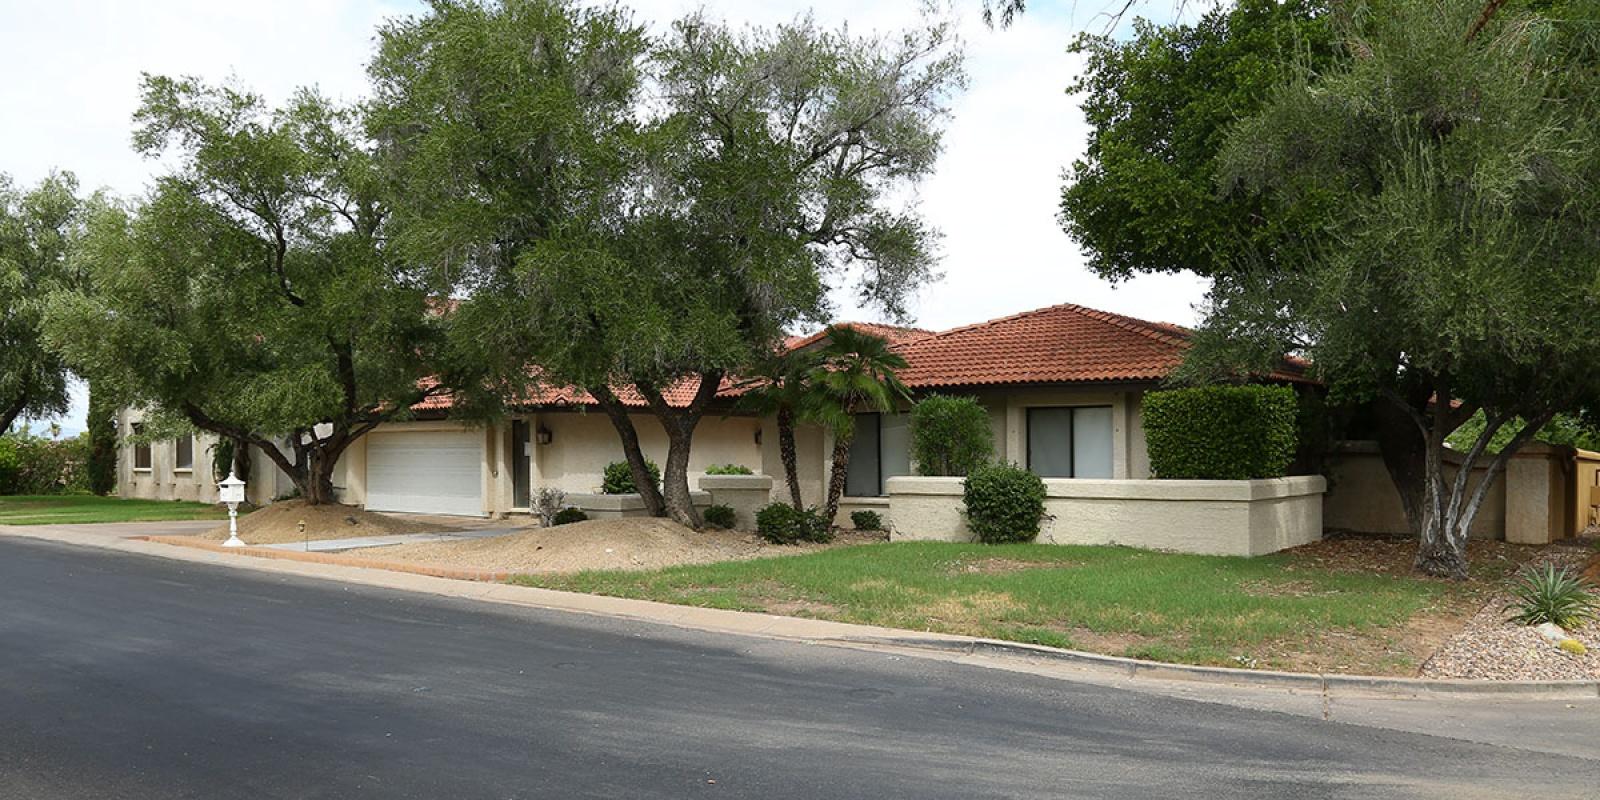 8901 N 47th Pl, Phoenix, Arizona 85028, ,SFR,Available,N 47th Pl,1201